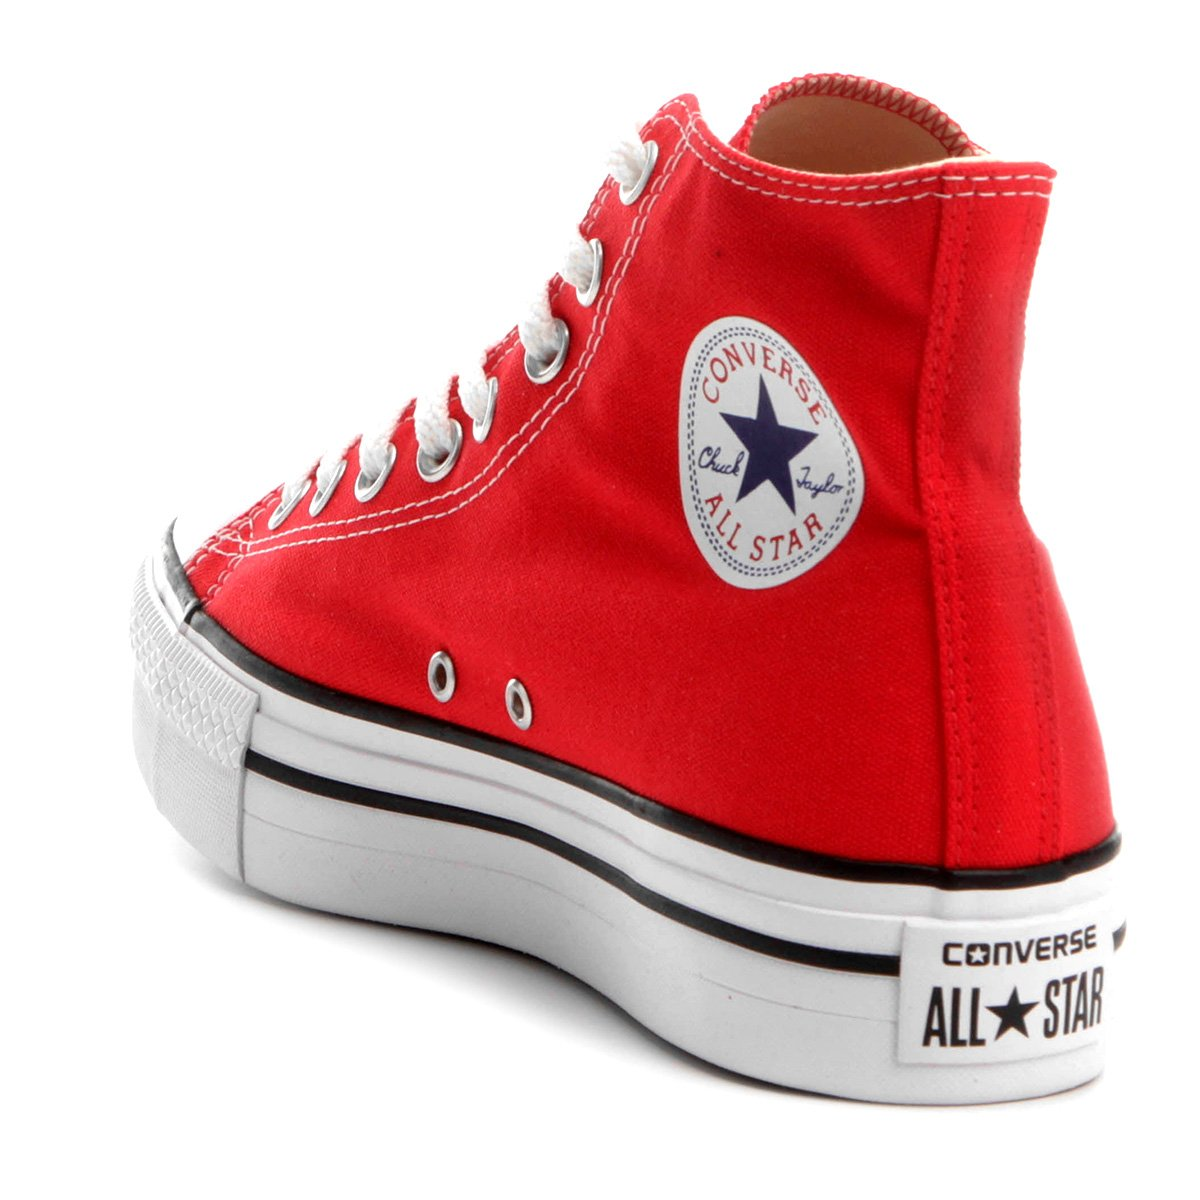 Tênis Converse Chuck Taylor All Star Platform Hi - Vermelho - Compre ... 840b2cc8d7ad4